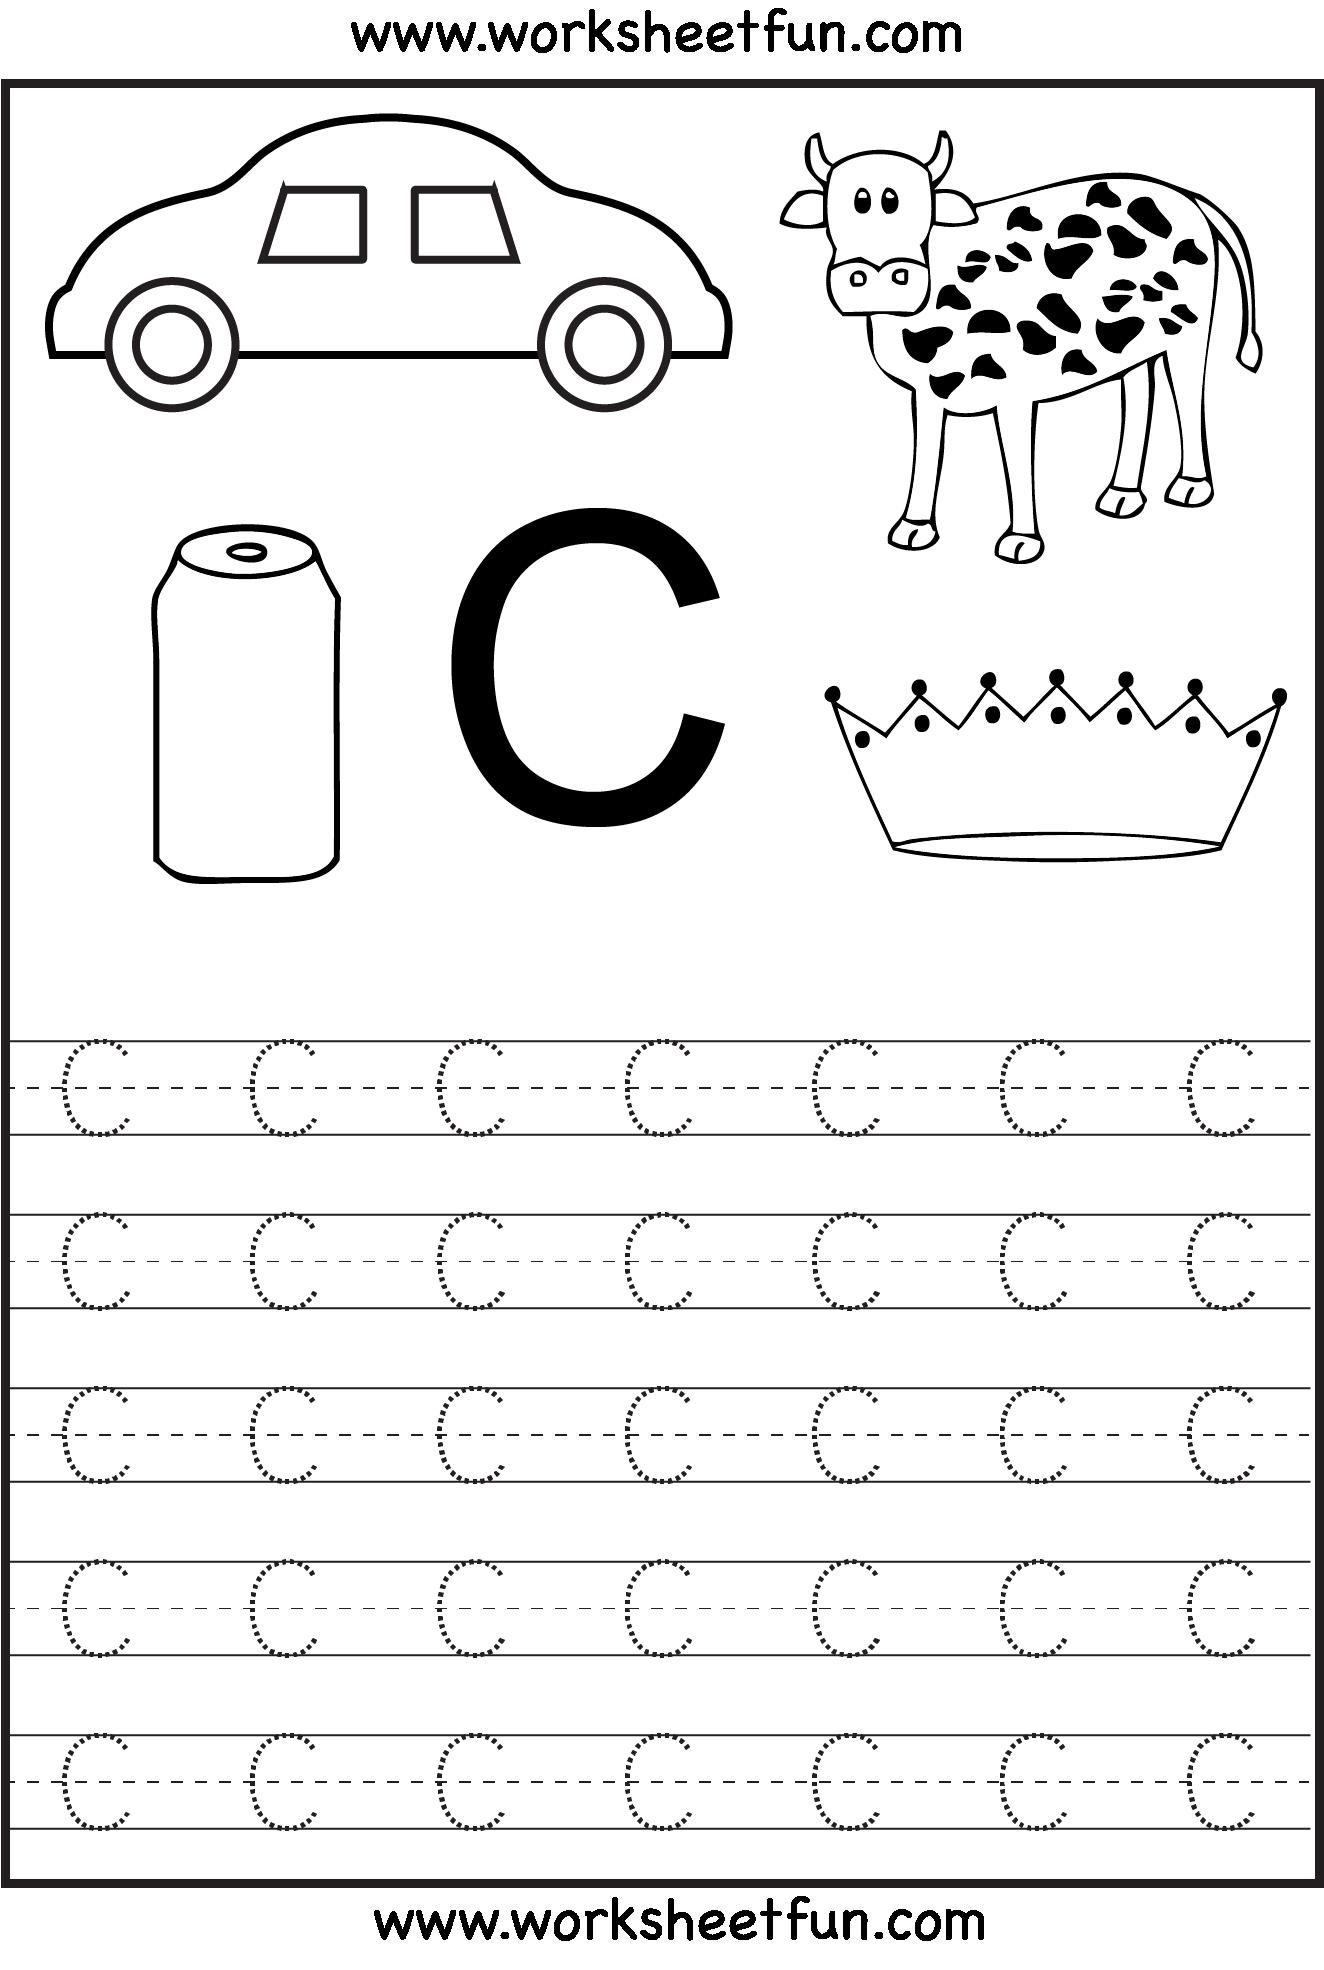 Letter Tracing Pages For Preschoolers Preschooler Development – Tracing the Alphabet Worksheets for Kindergarten